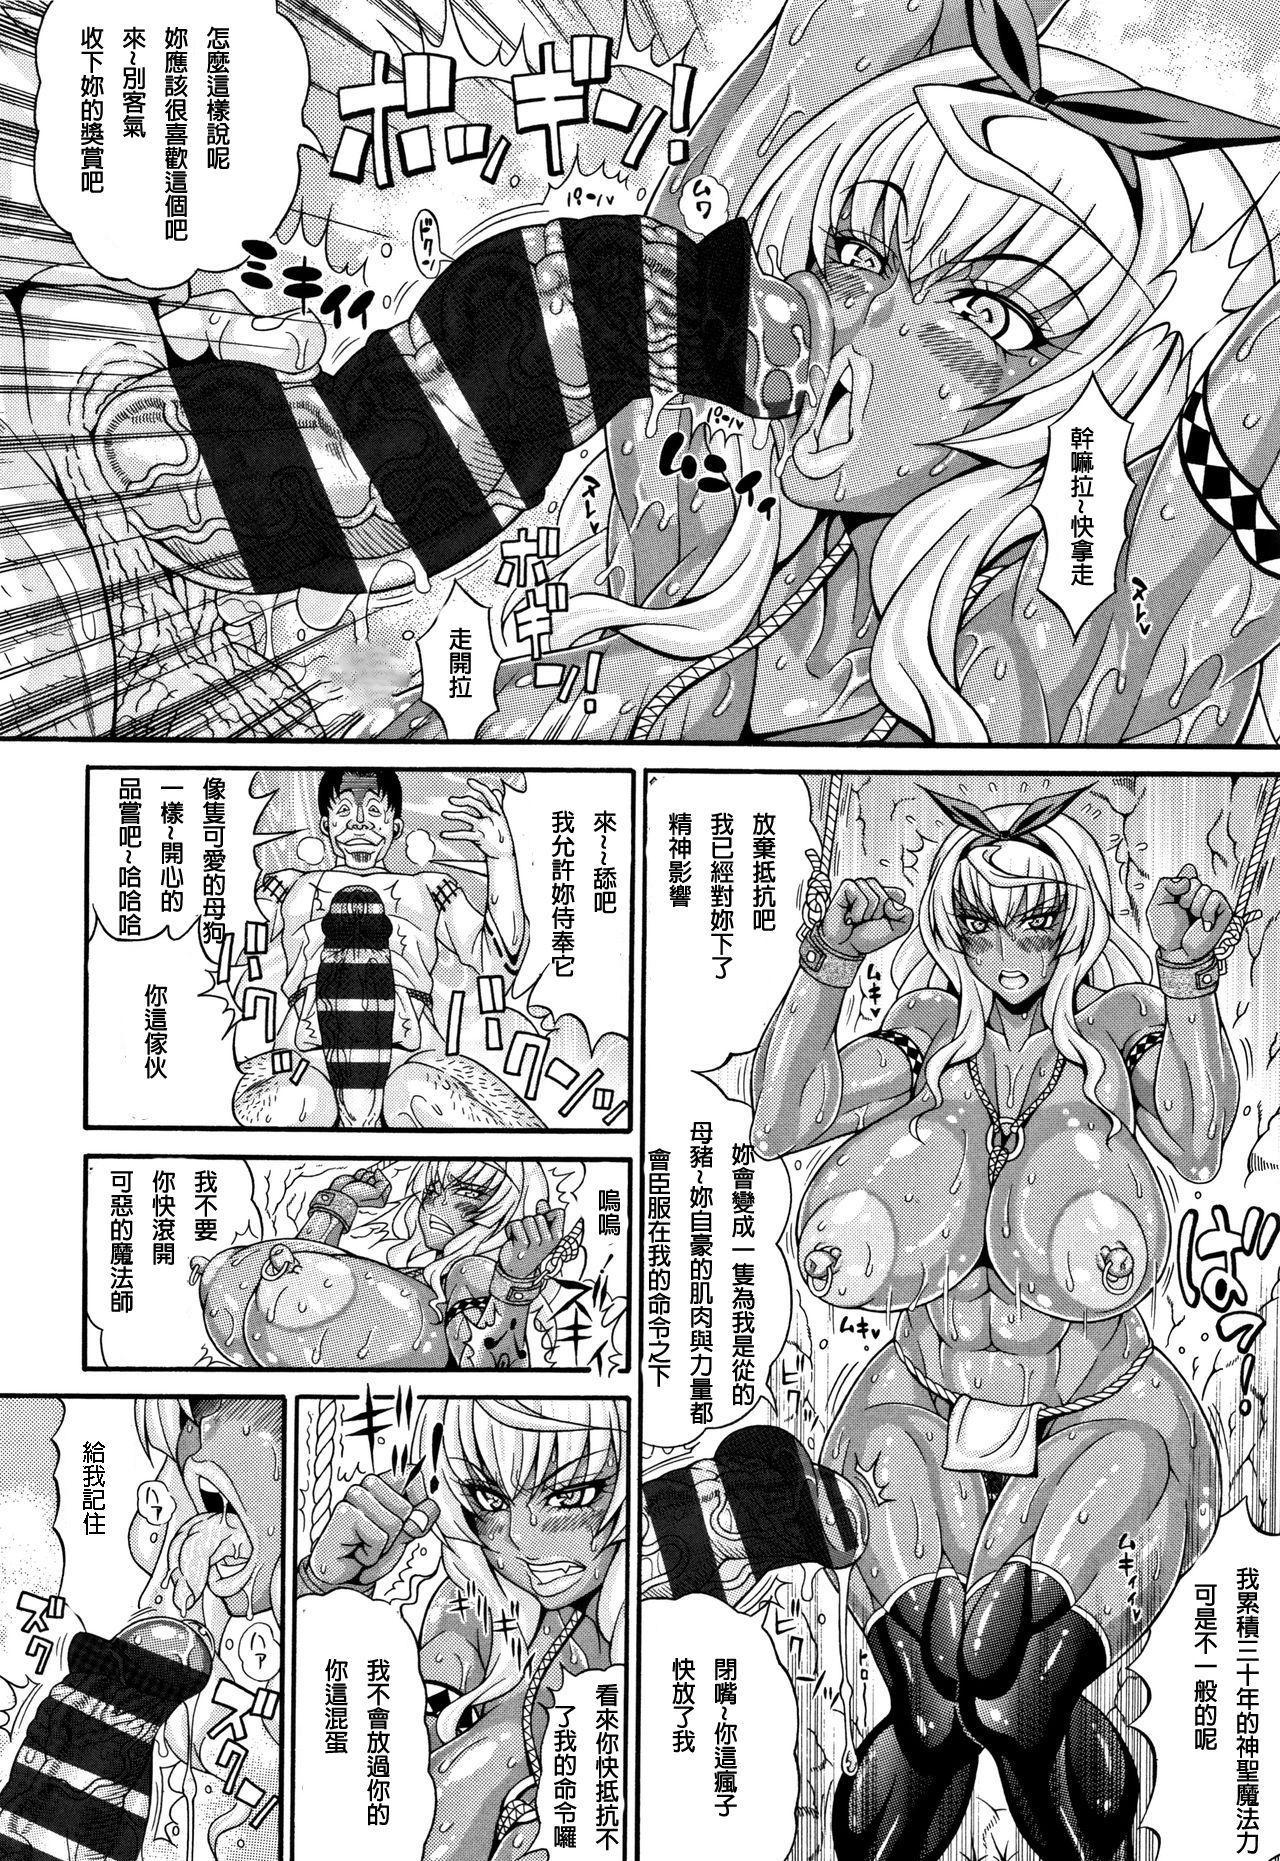 Mahoutsukai Musou 3